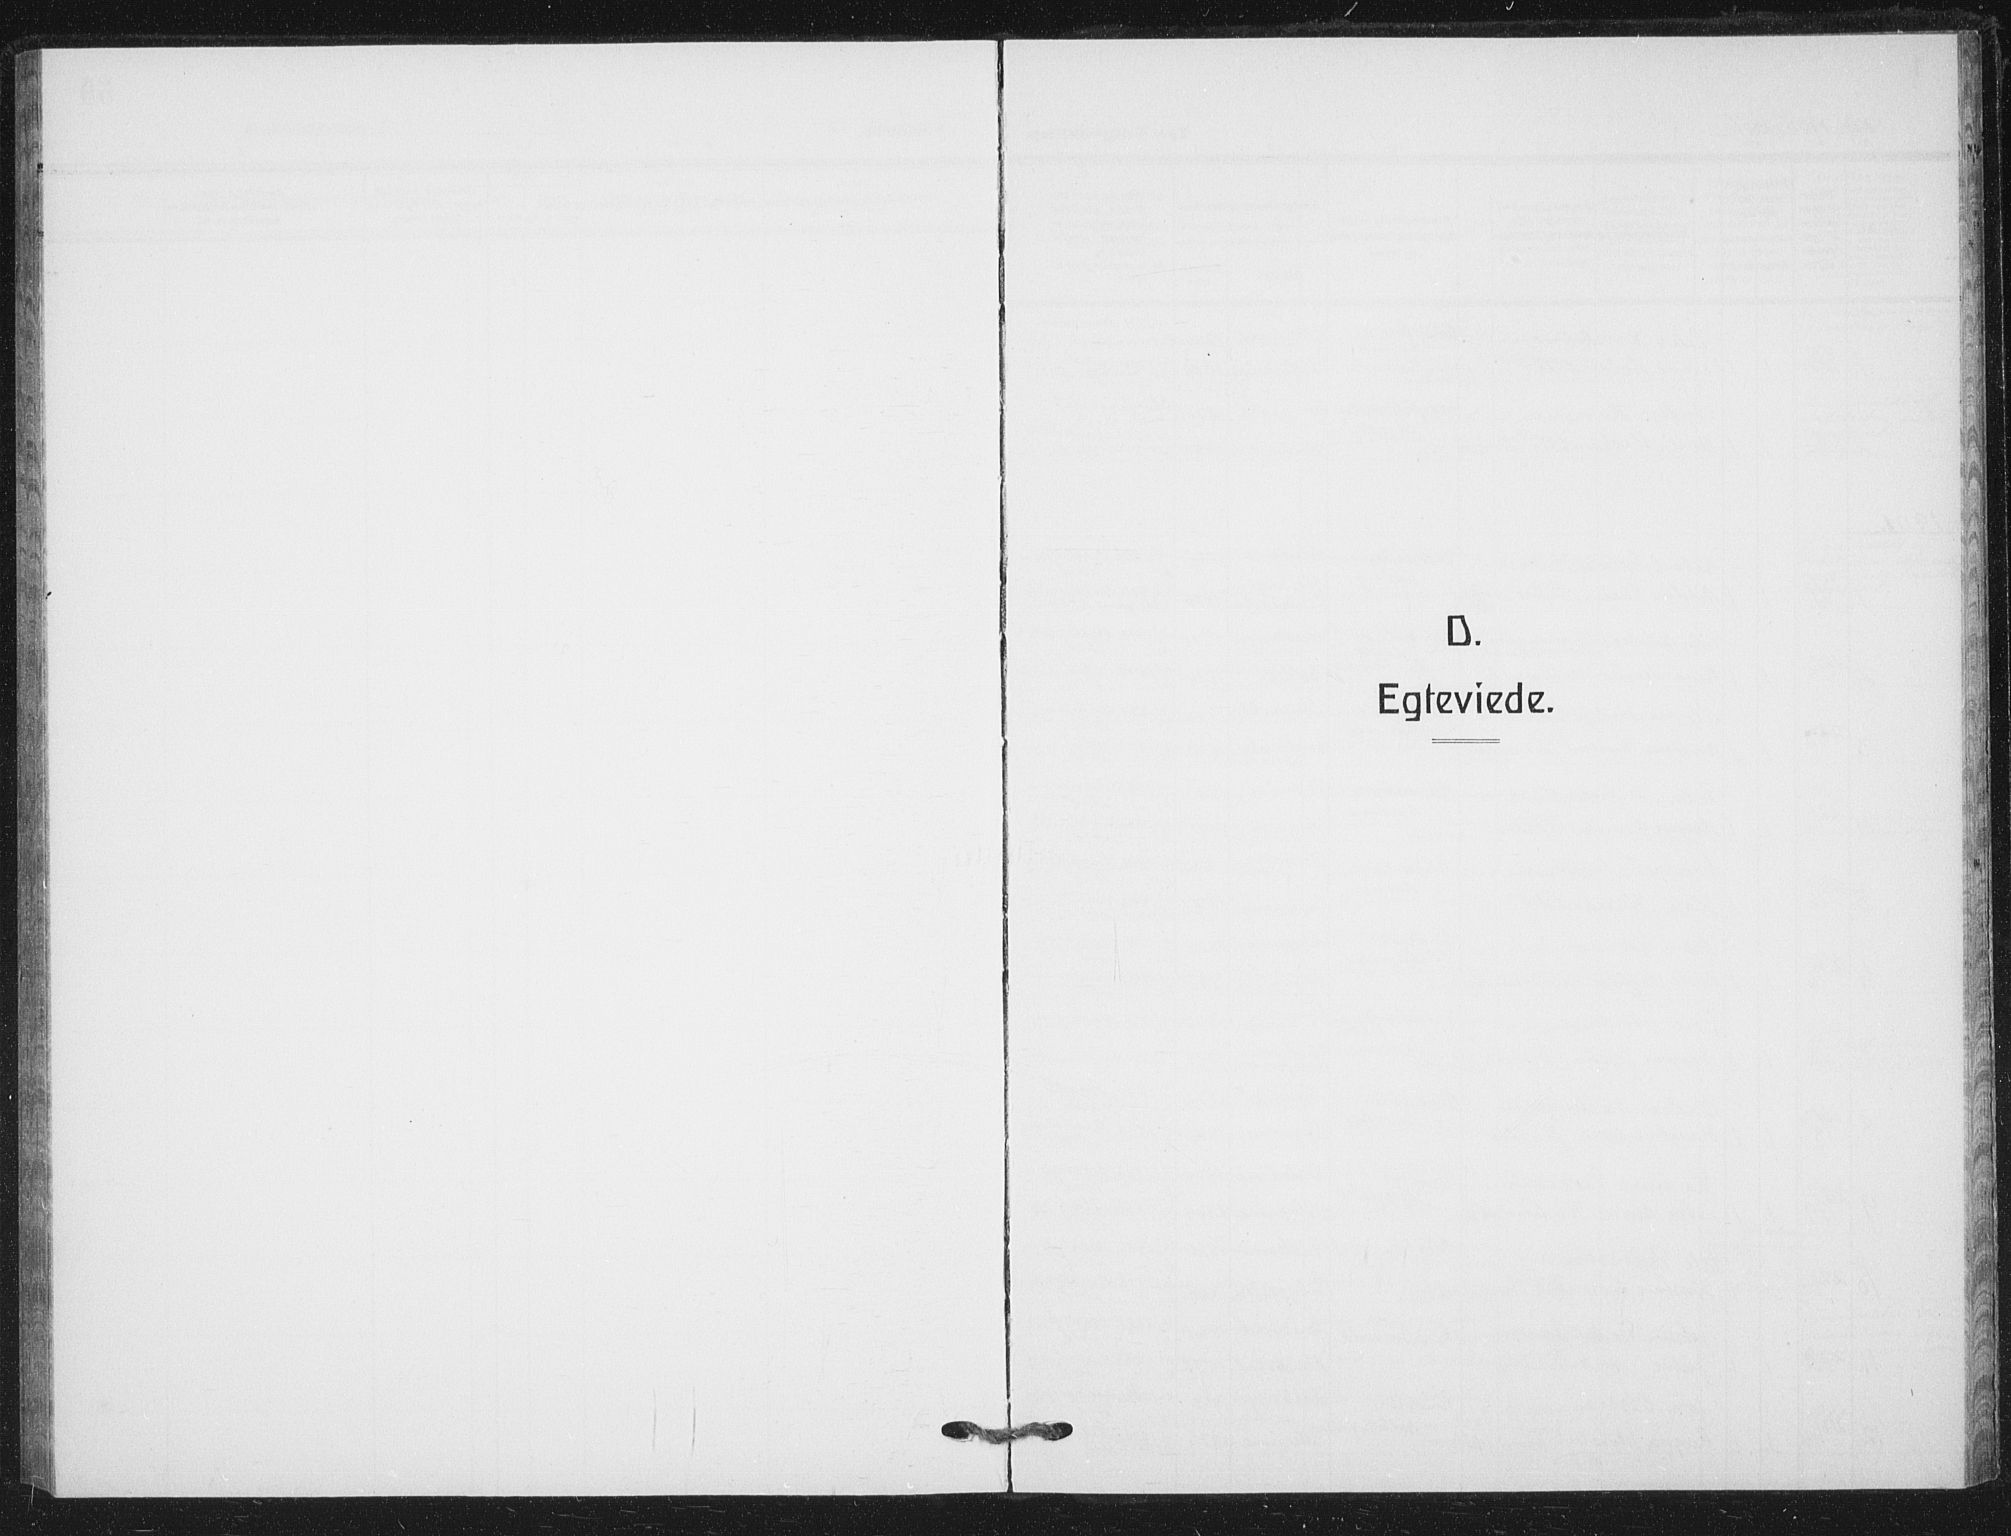 SATØ, Målselv sokneprestembete, G/Ga/Gab/L0012klokker: Parish register (copy) no. 12, 1900-1936